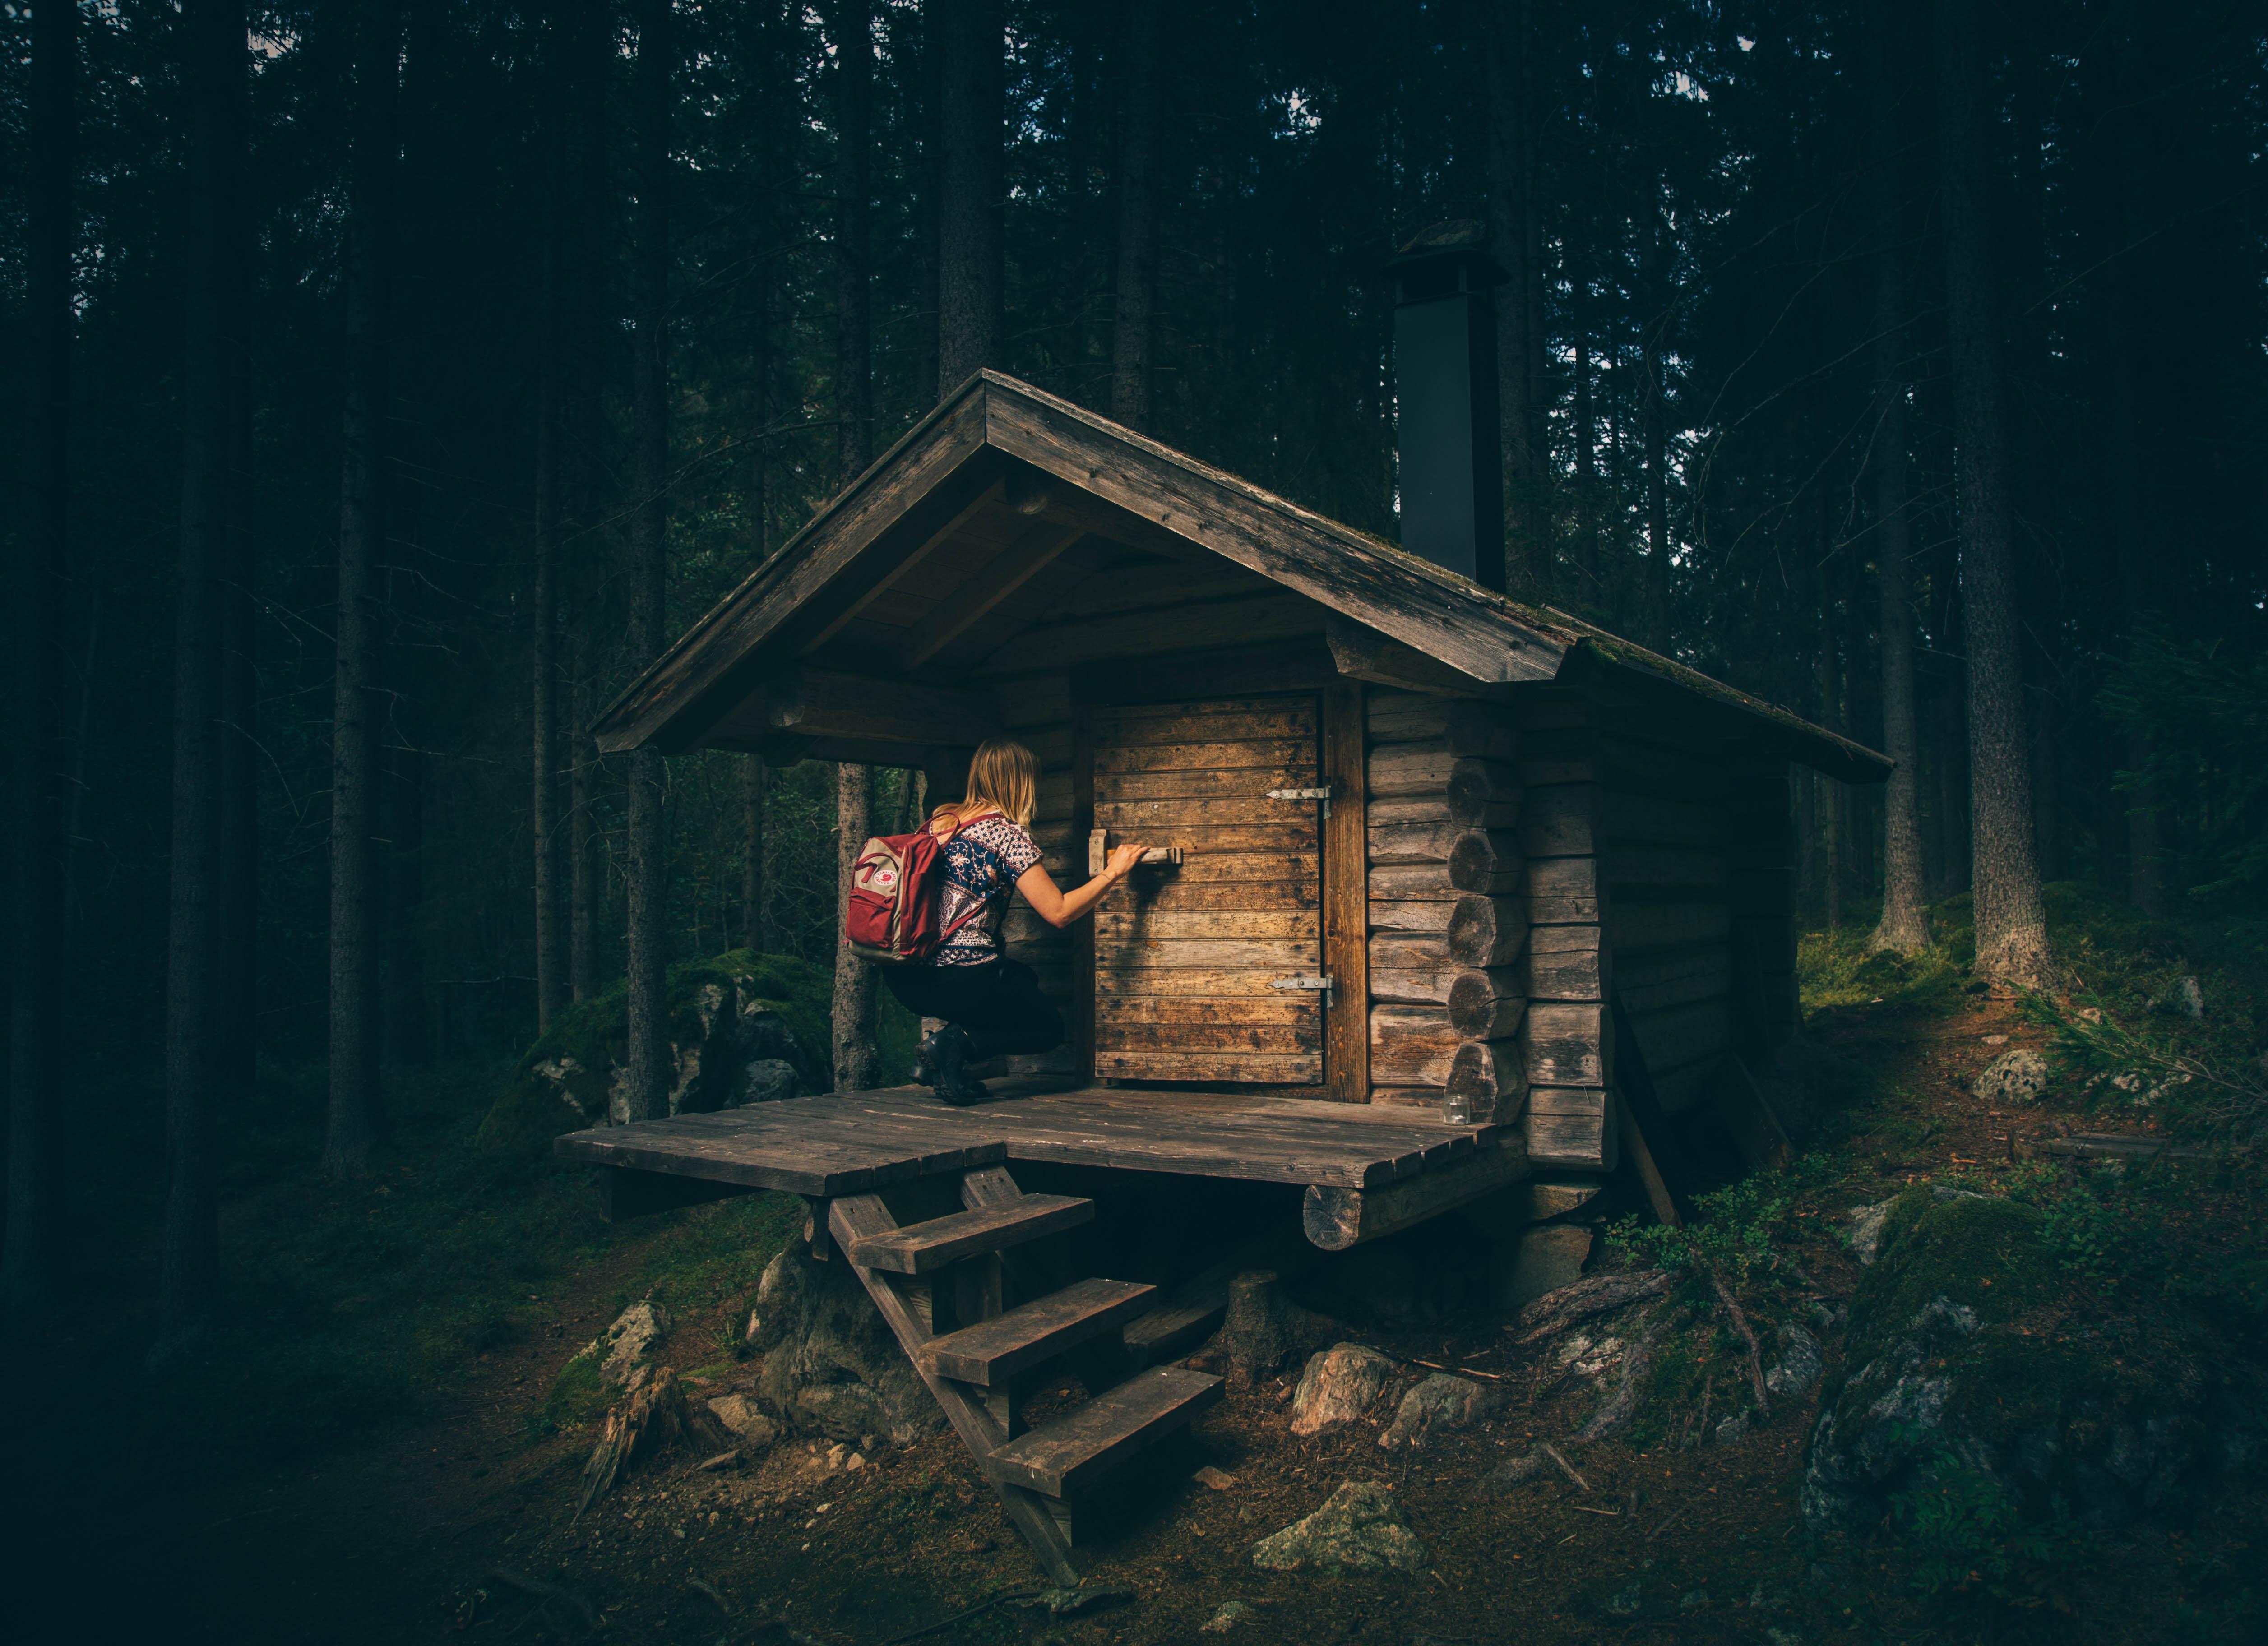 Landscape Forest Person Light Woman Night House Sunlight Travel Hut Log Cabin Soil Darkness Rocks Woods